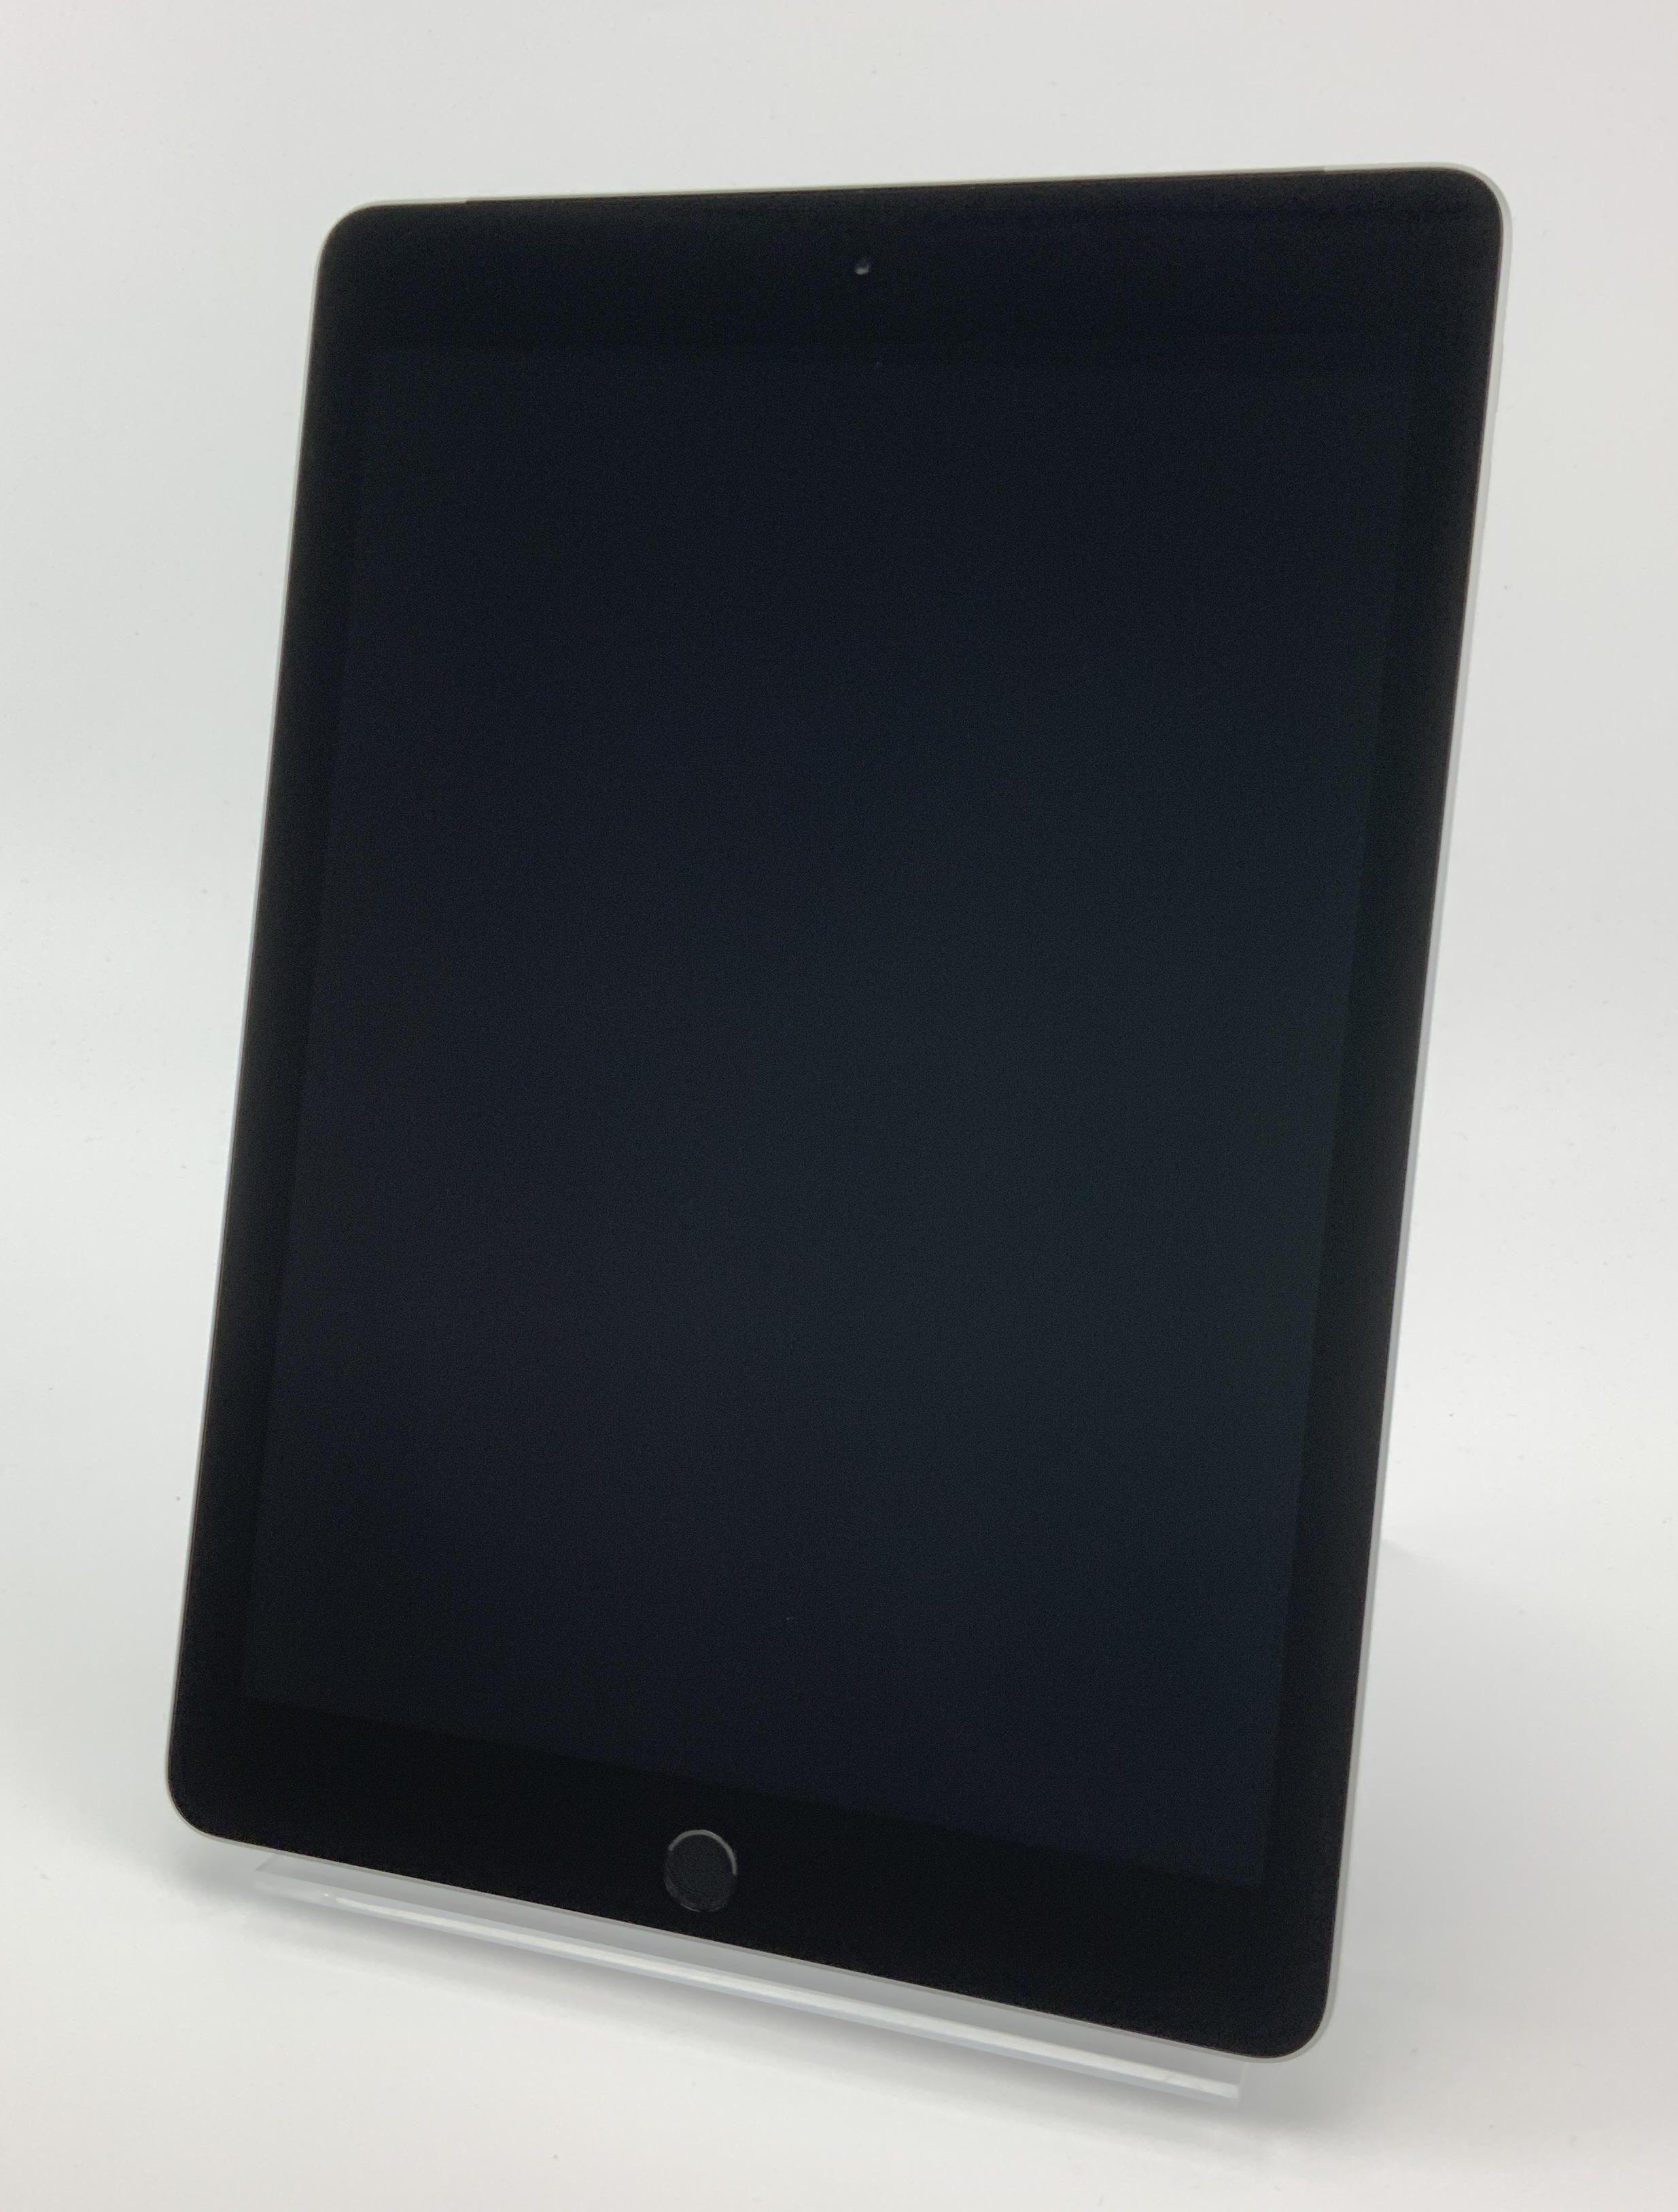 iPad 6 Wi-Fi + Cellular 128GB, 128GB, Space Gray, Bild 3